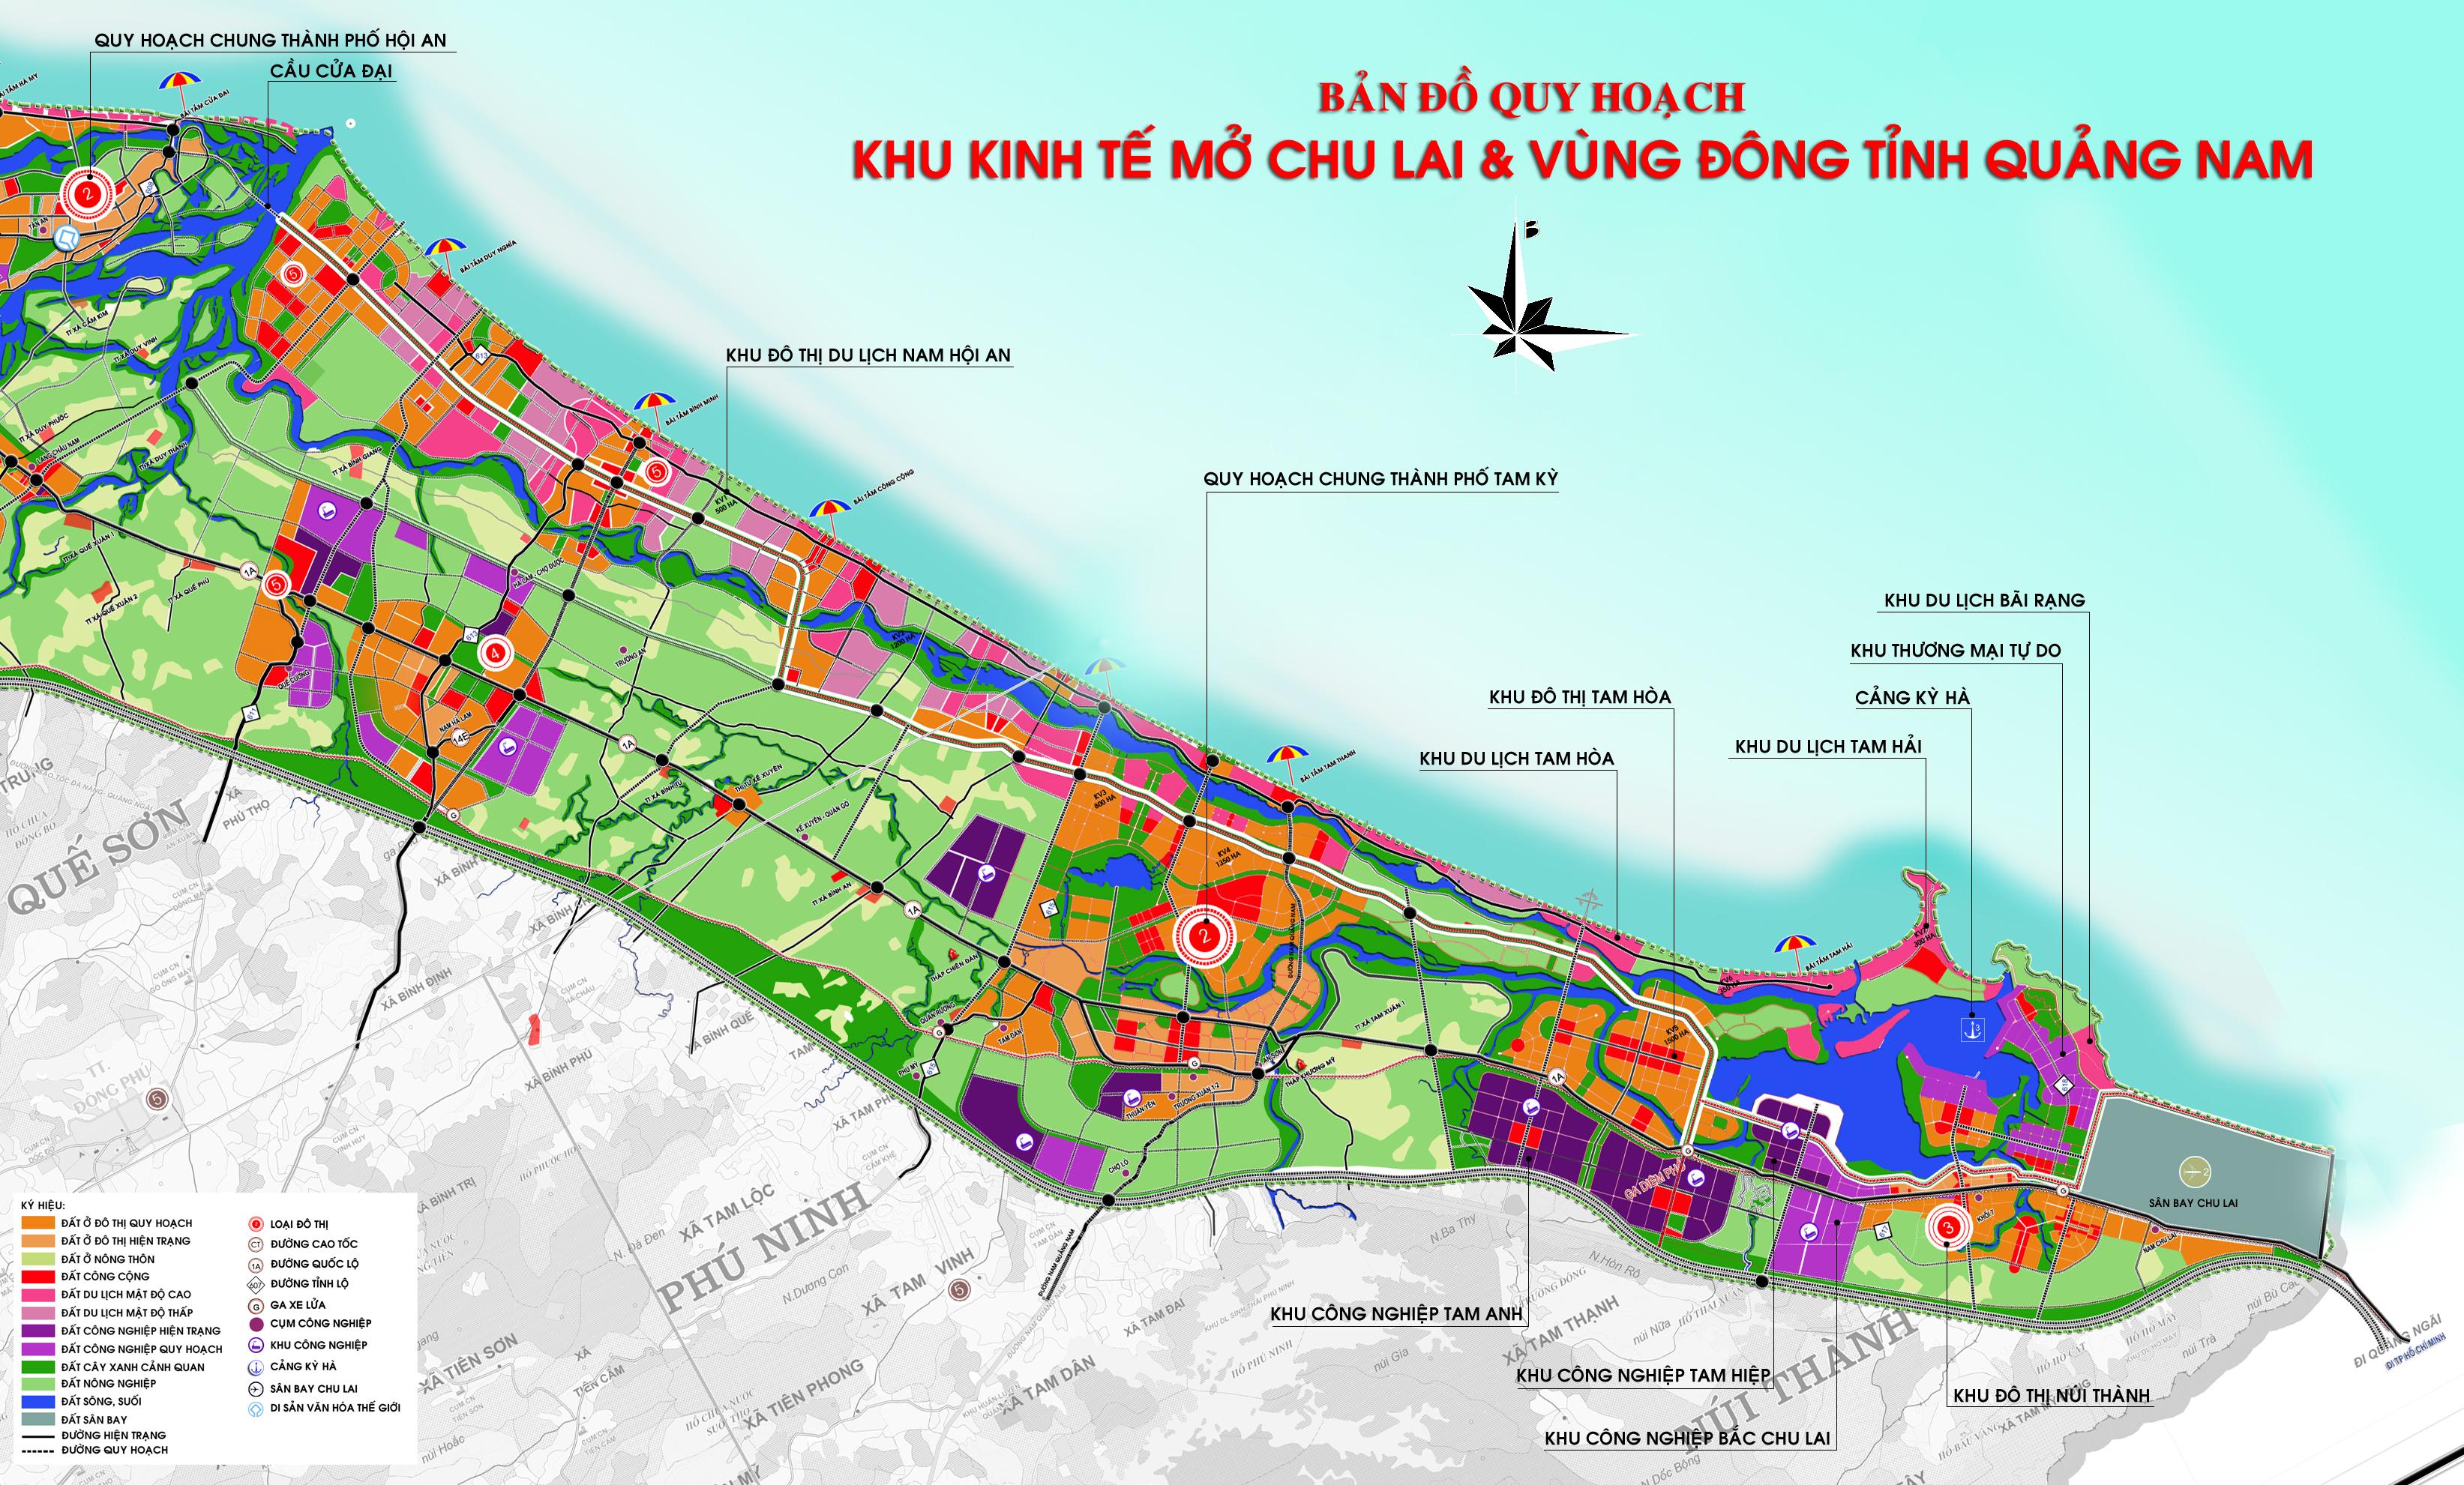 Non-tariff area of Chu Lai Open EZ covers 1,012 hectares